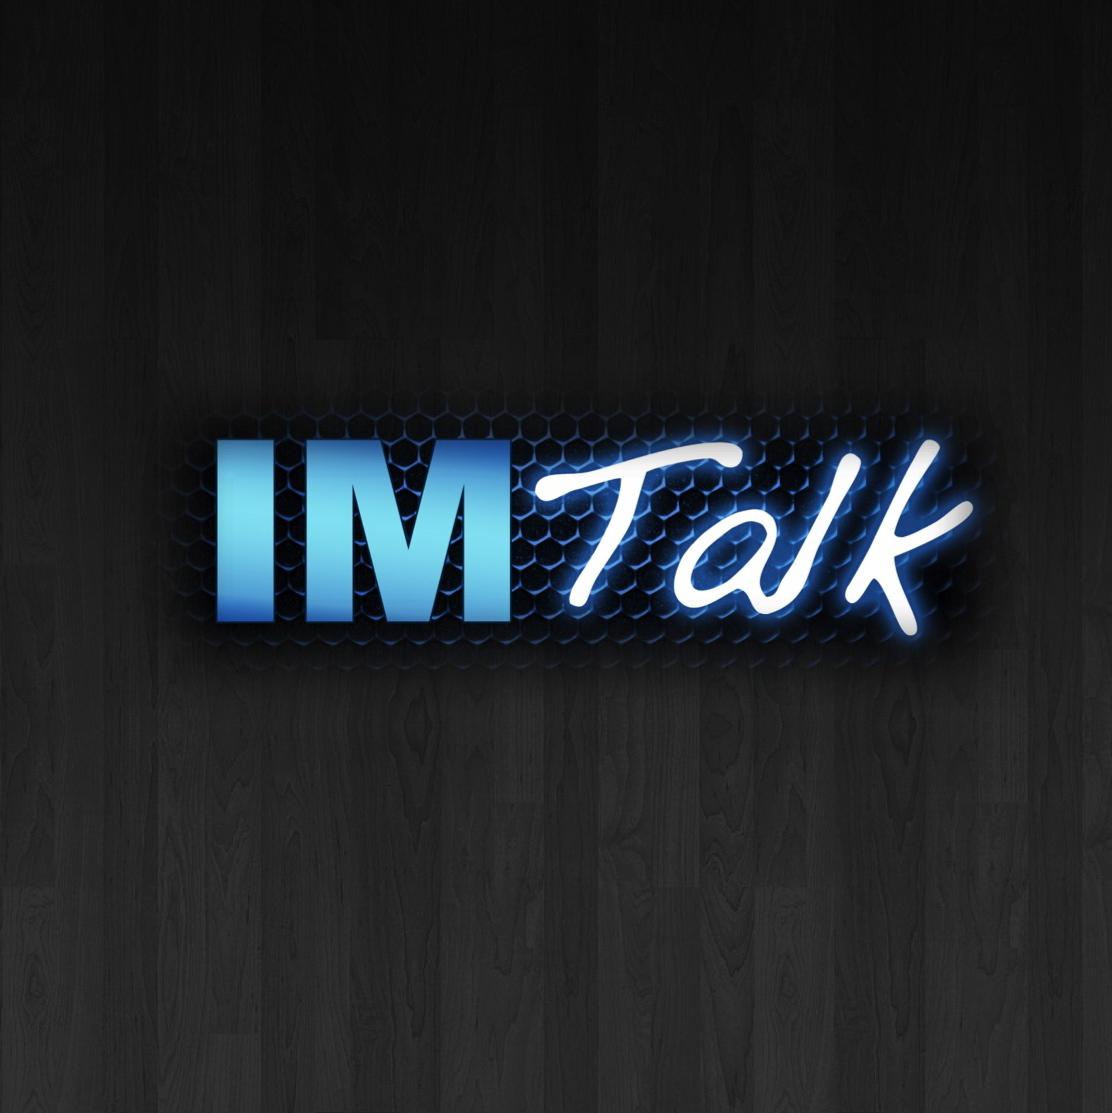 IMTalk Episode 723 - Nikki Barlett show art